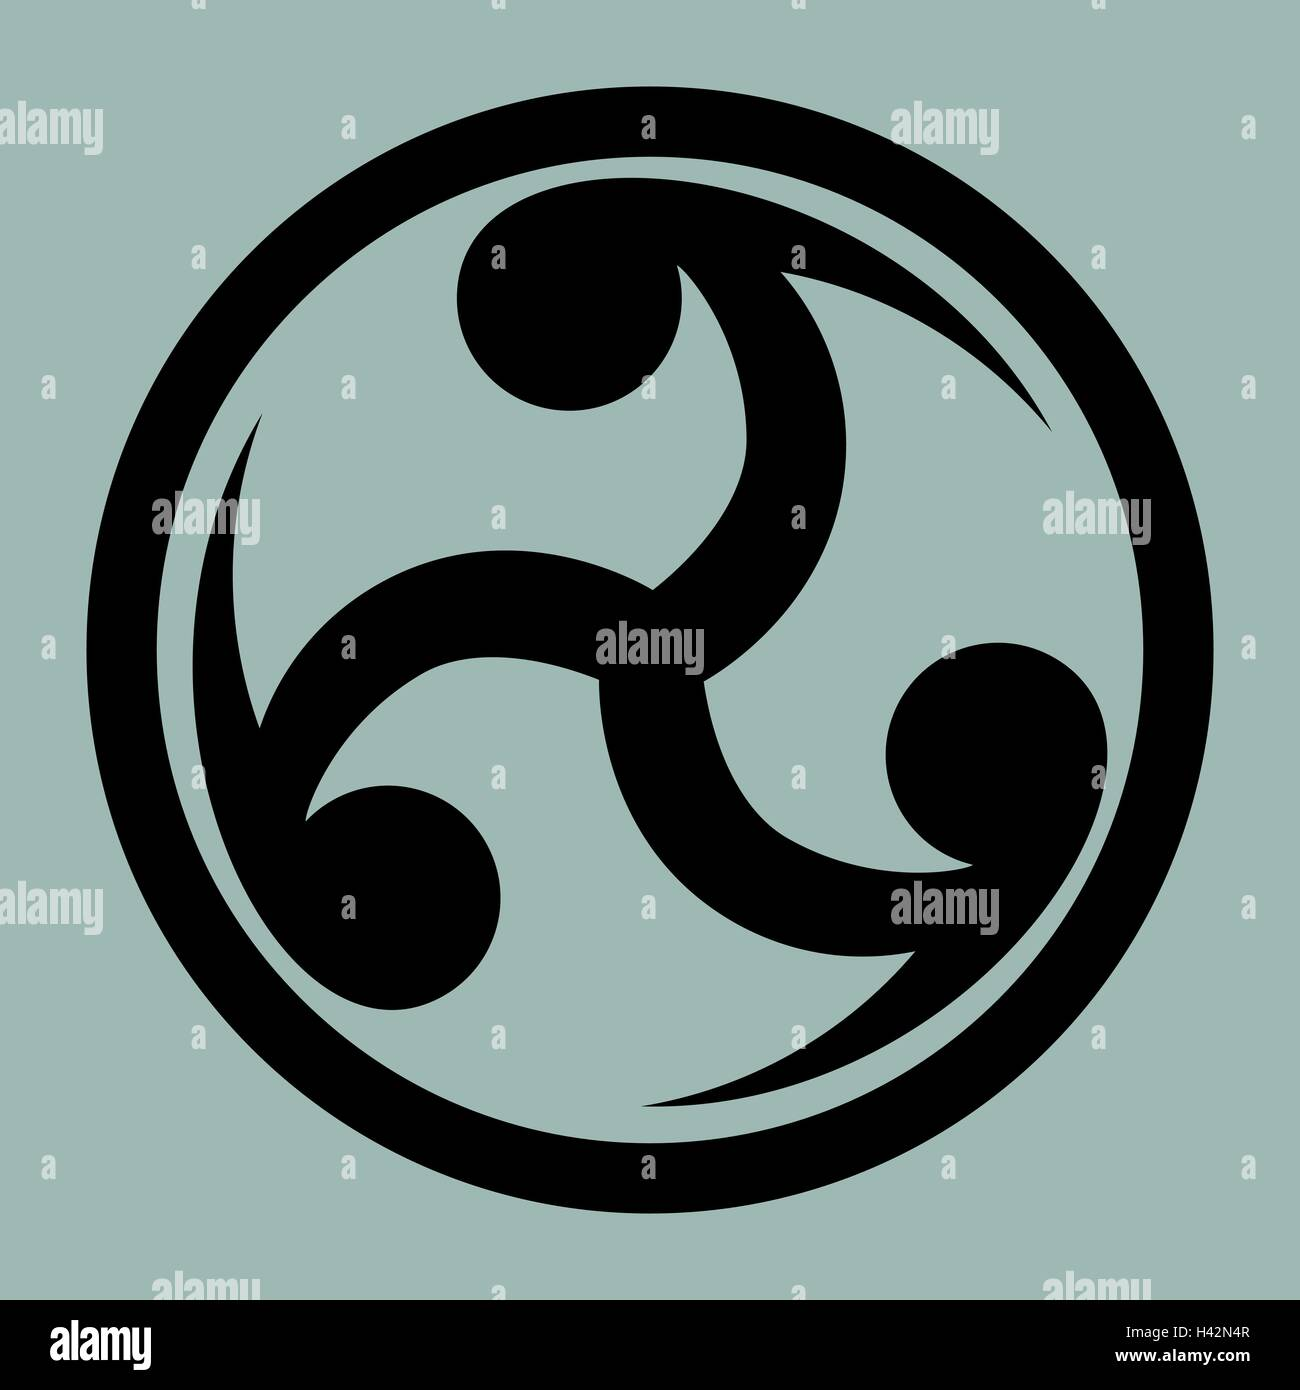 Mitsu Tomoe Japanese Symbol As A Visual Representation Of The